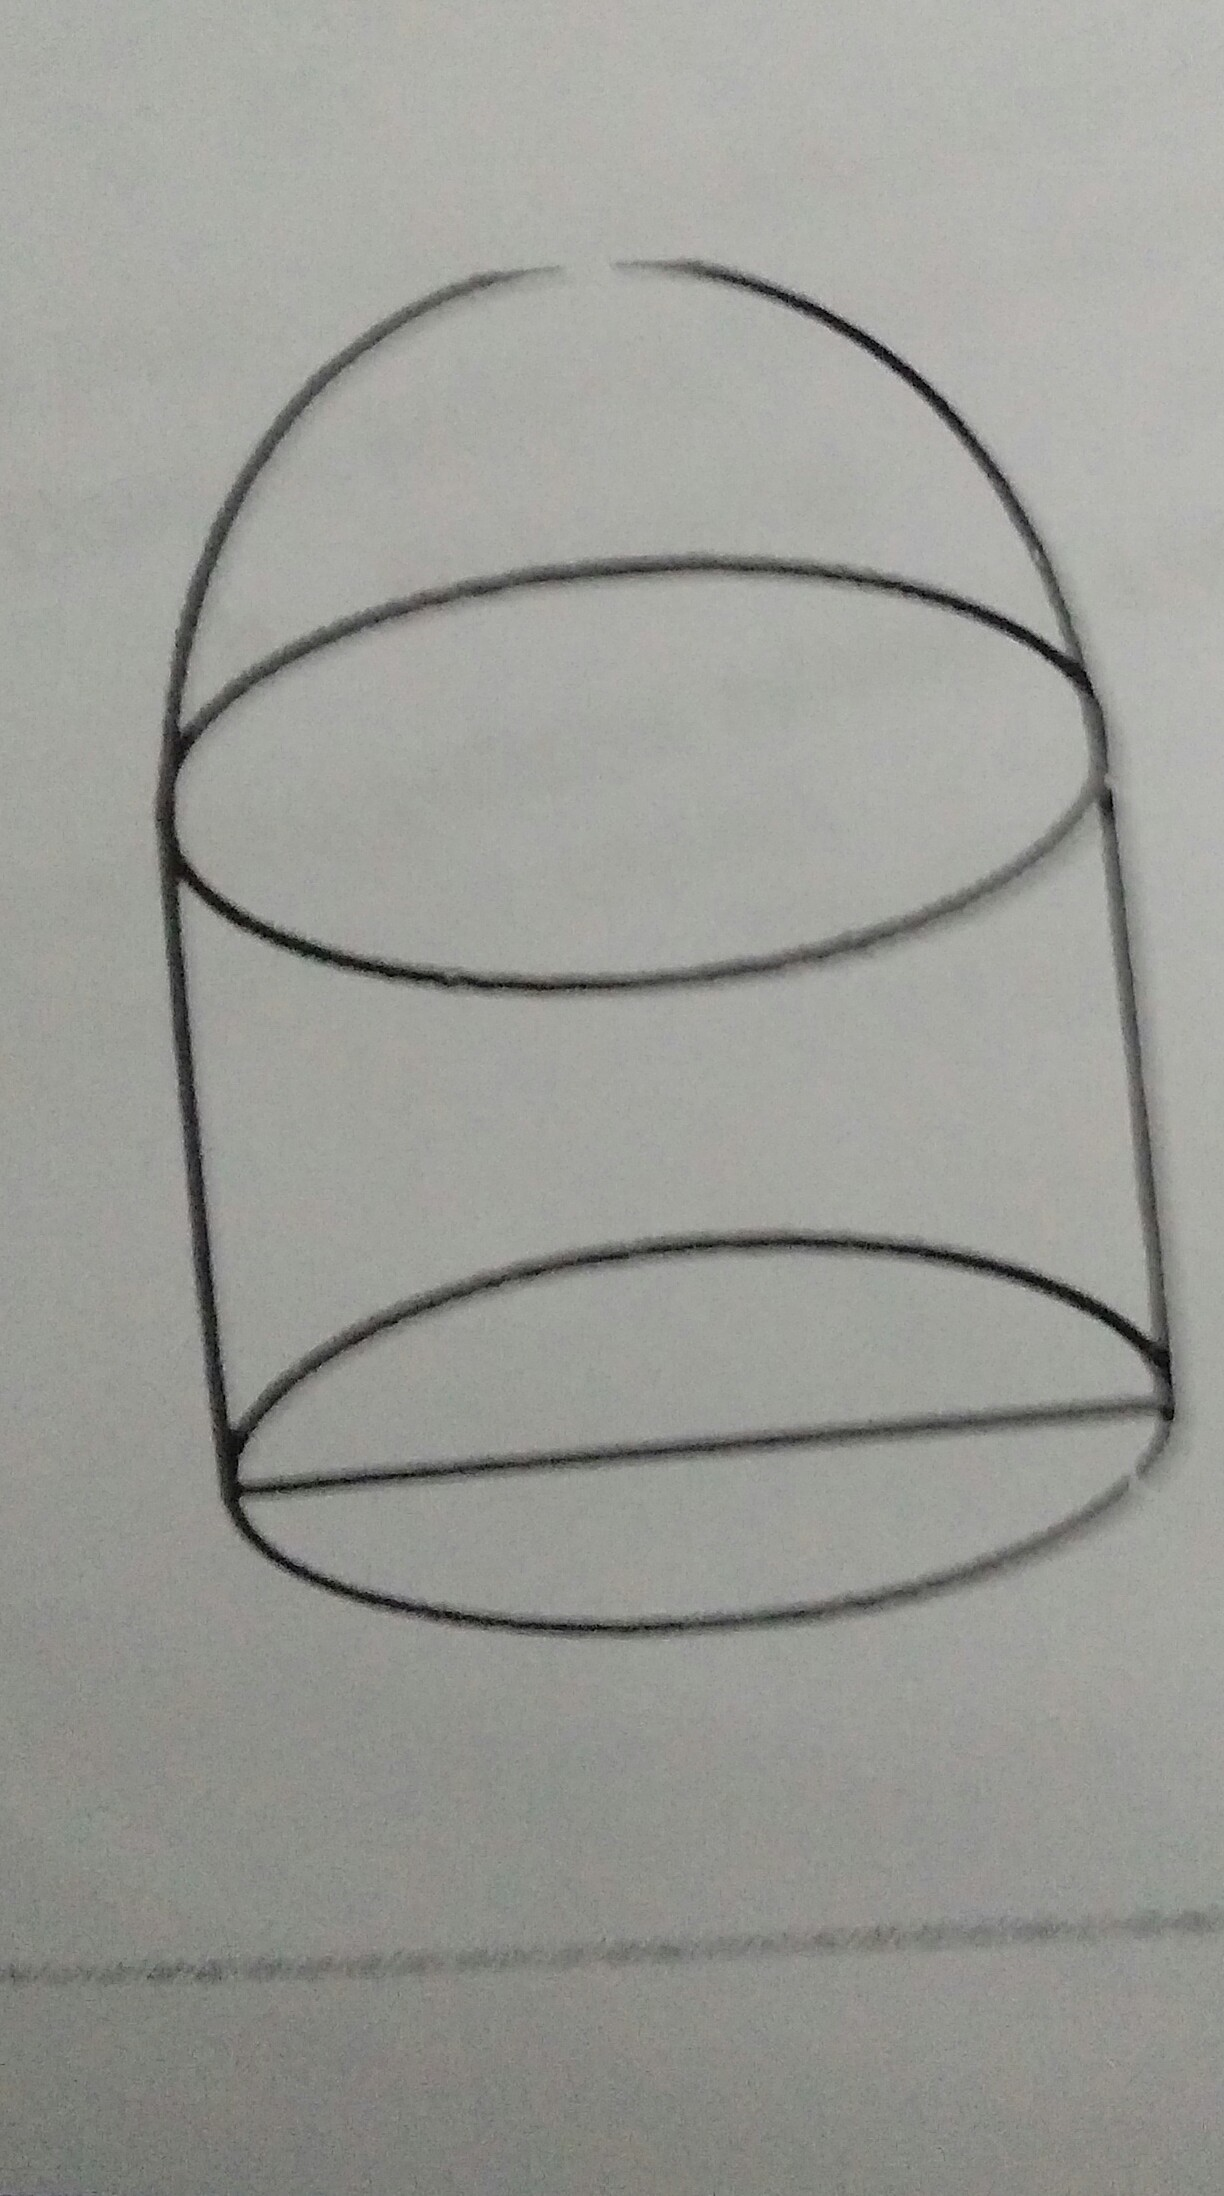 Diketahui sebuah benda gabungan tabung dan setengah bola ...